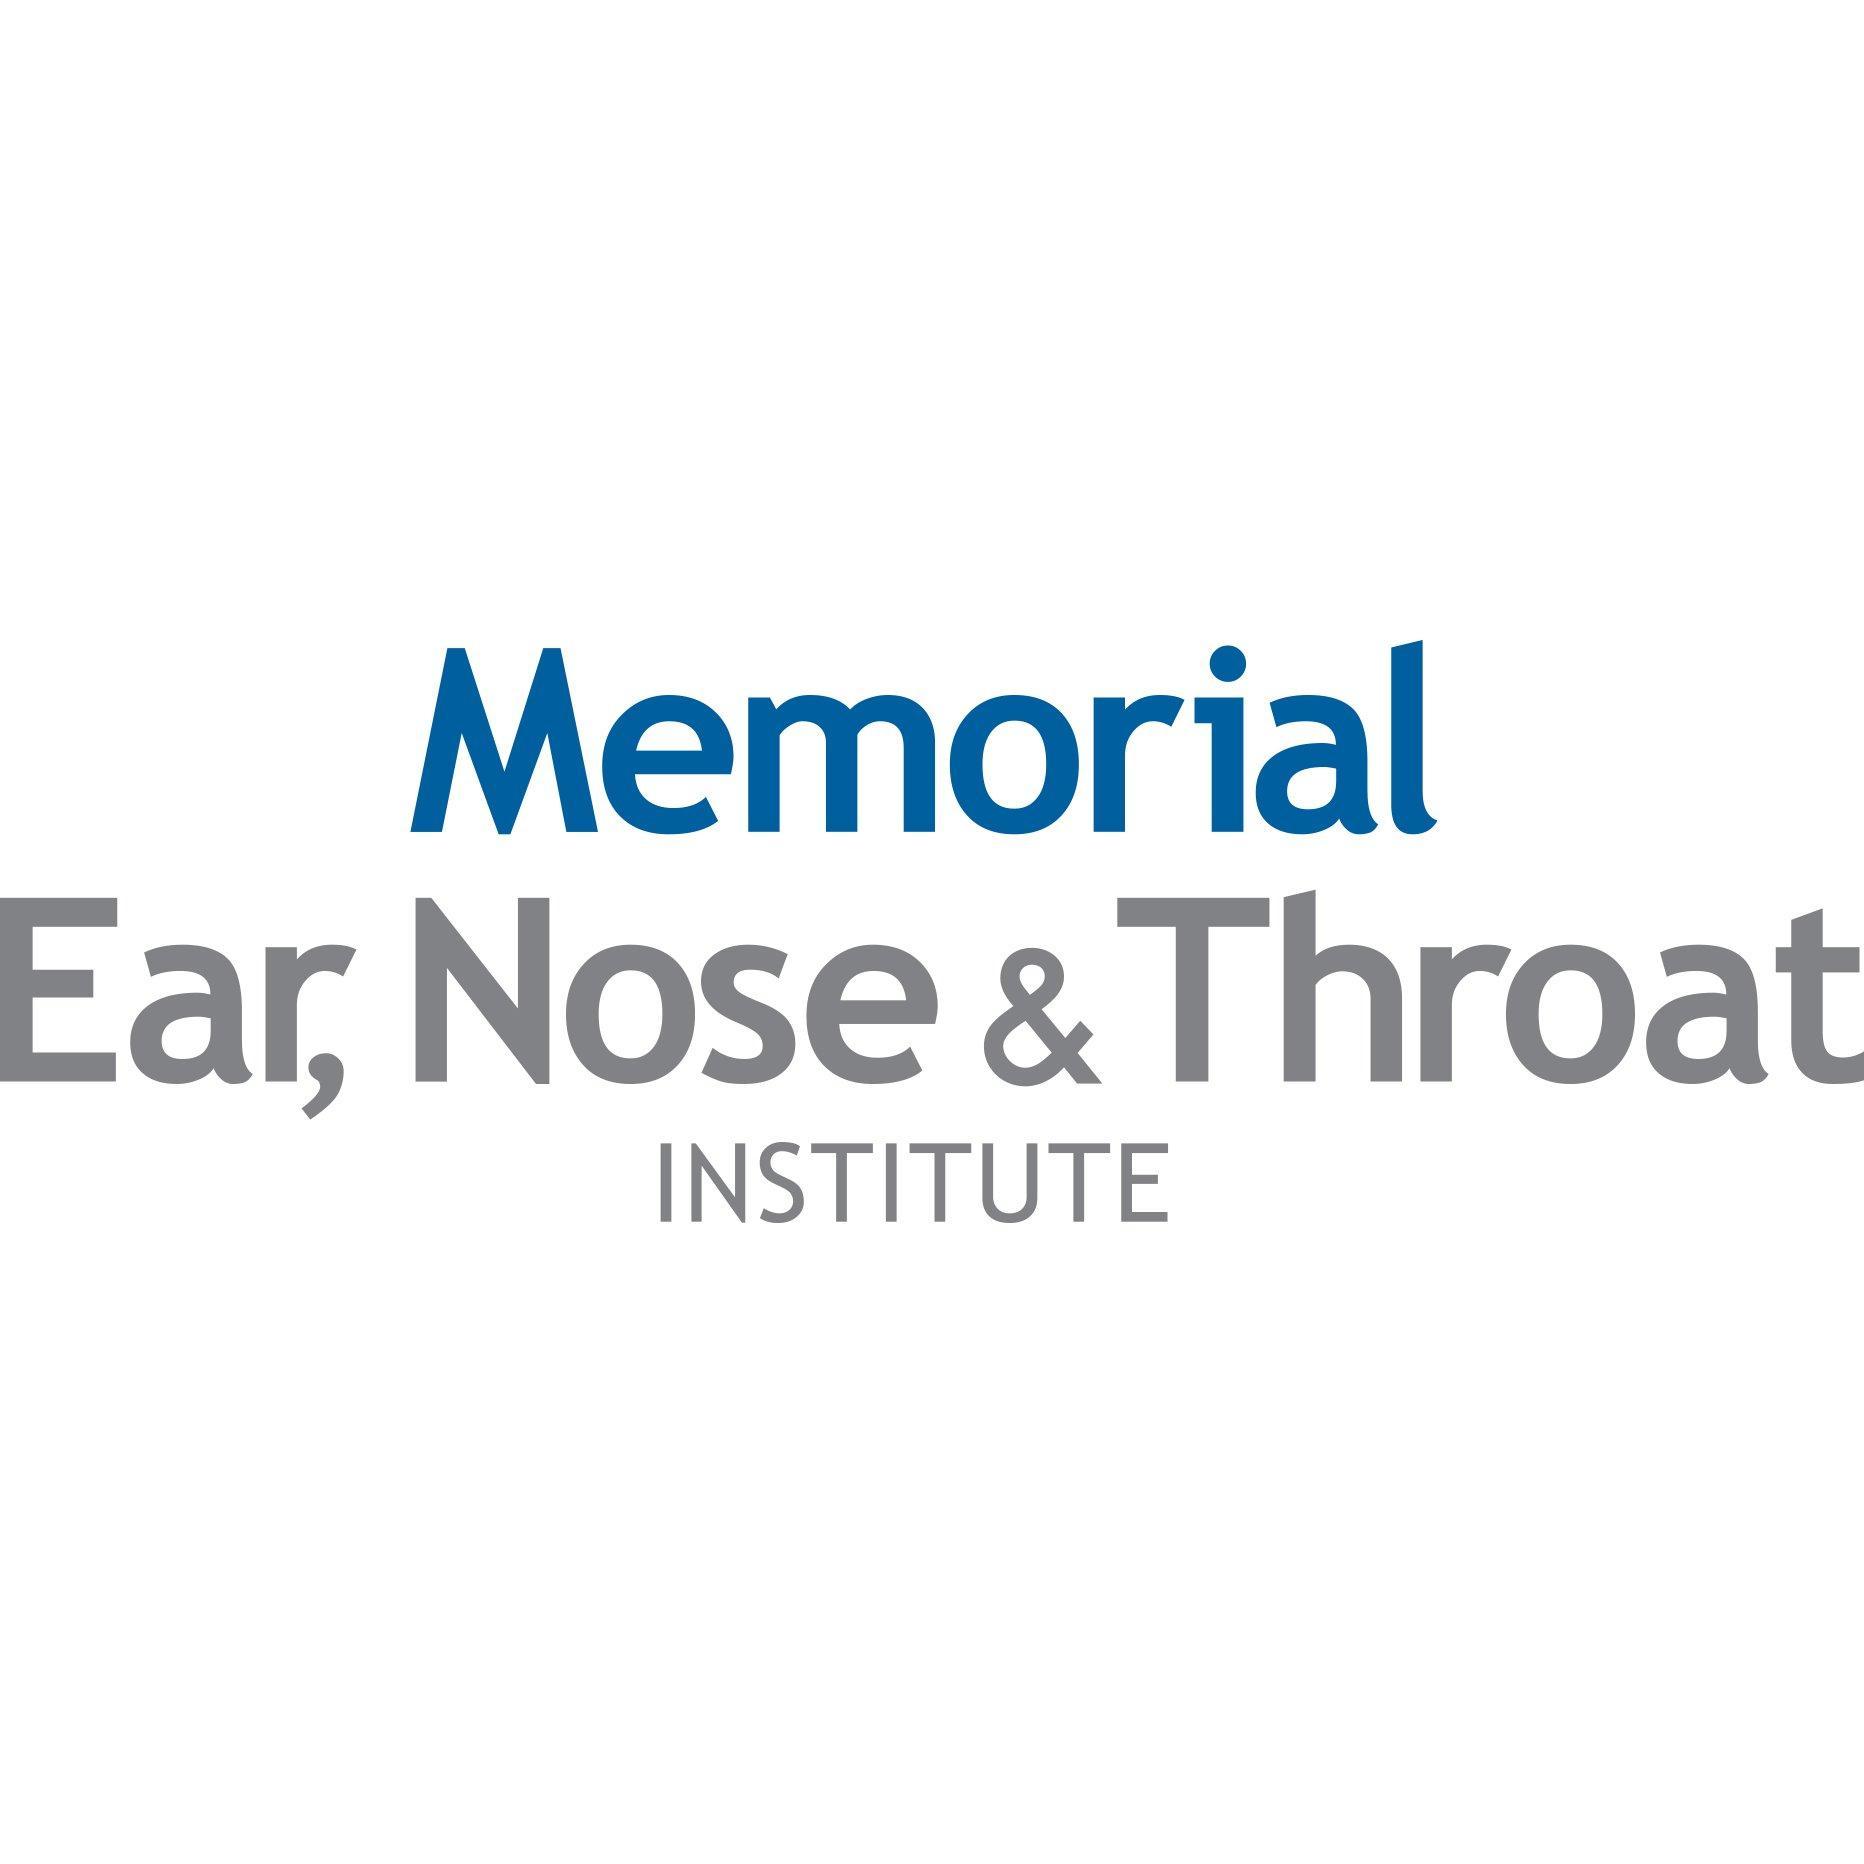 Memorial Ear, Nose and Throat Institute Logo